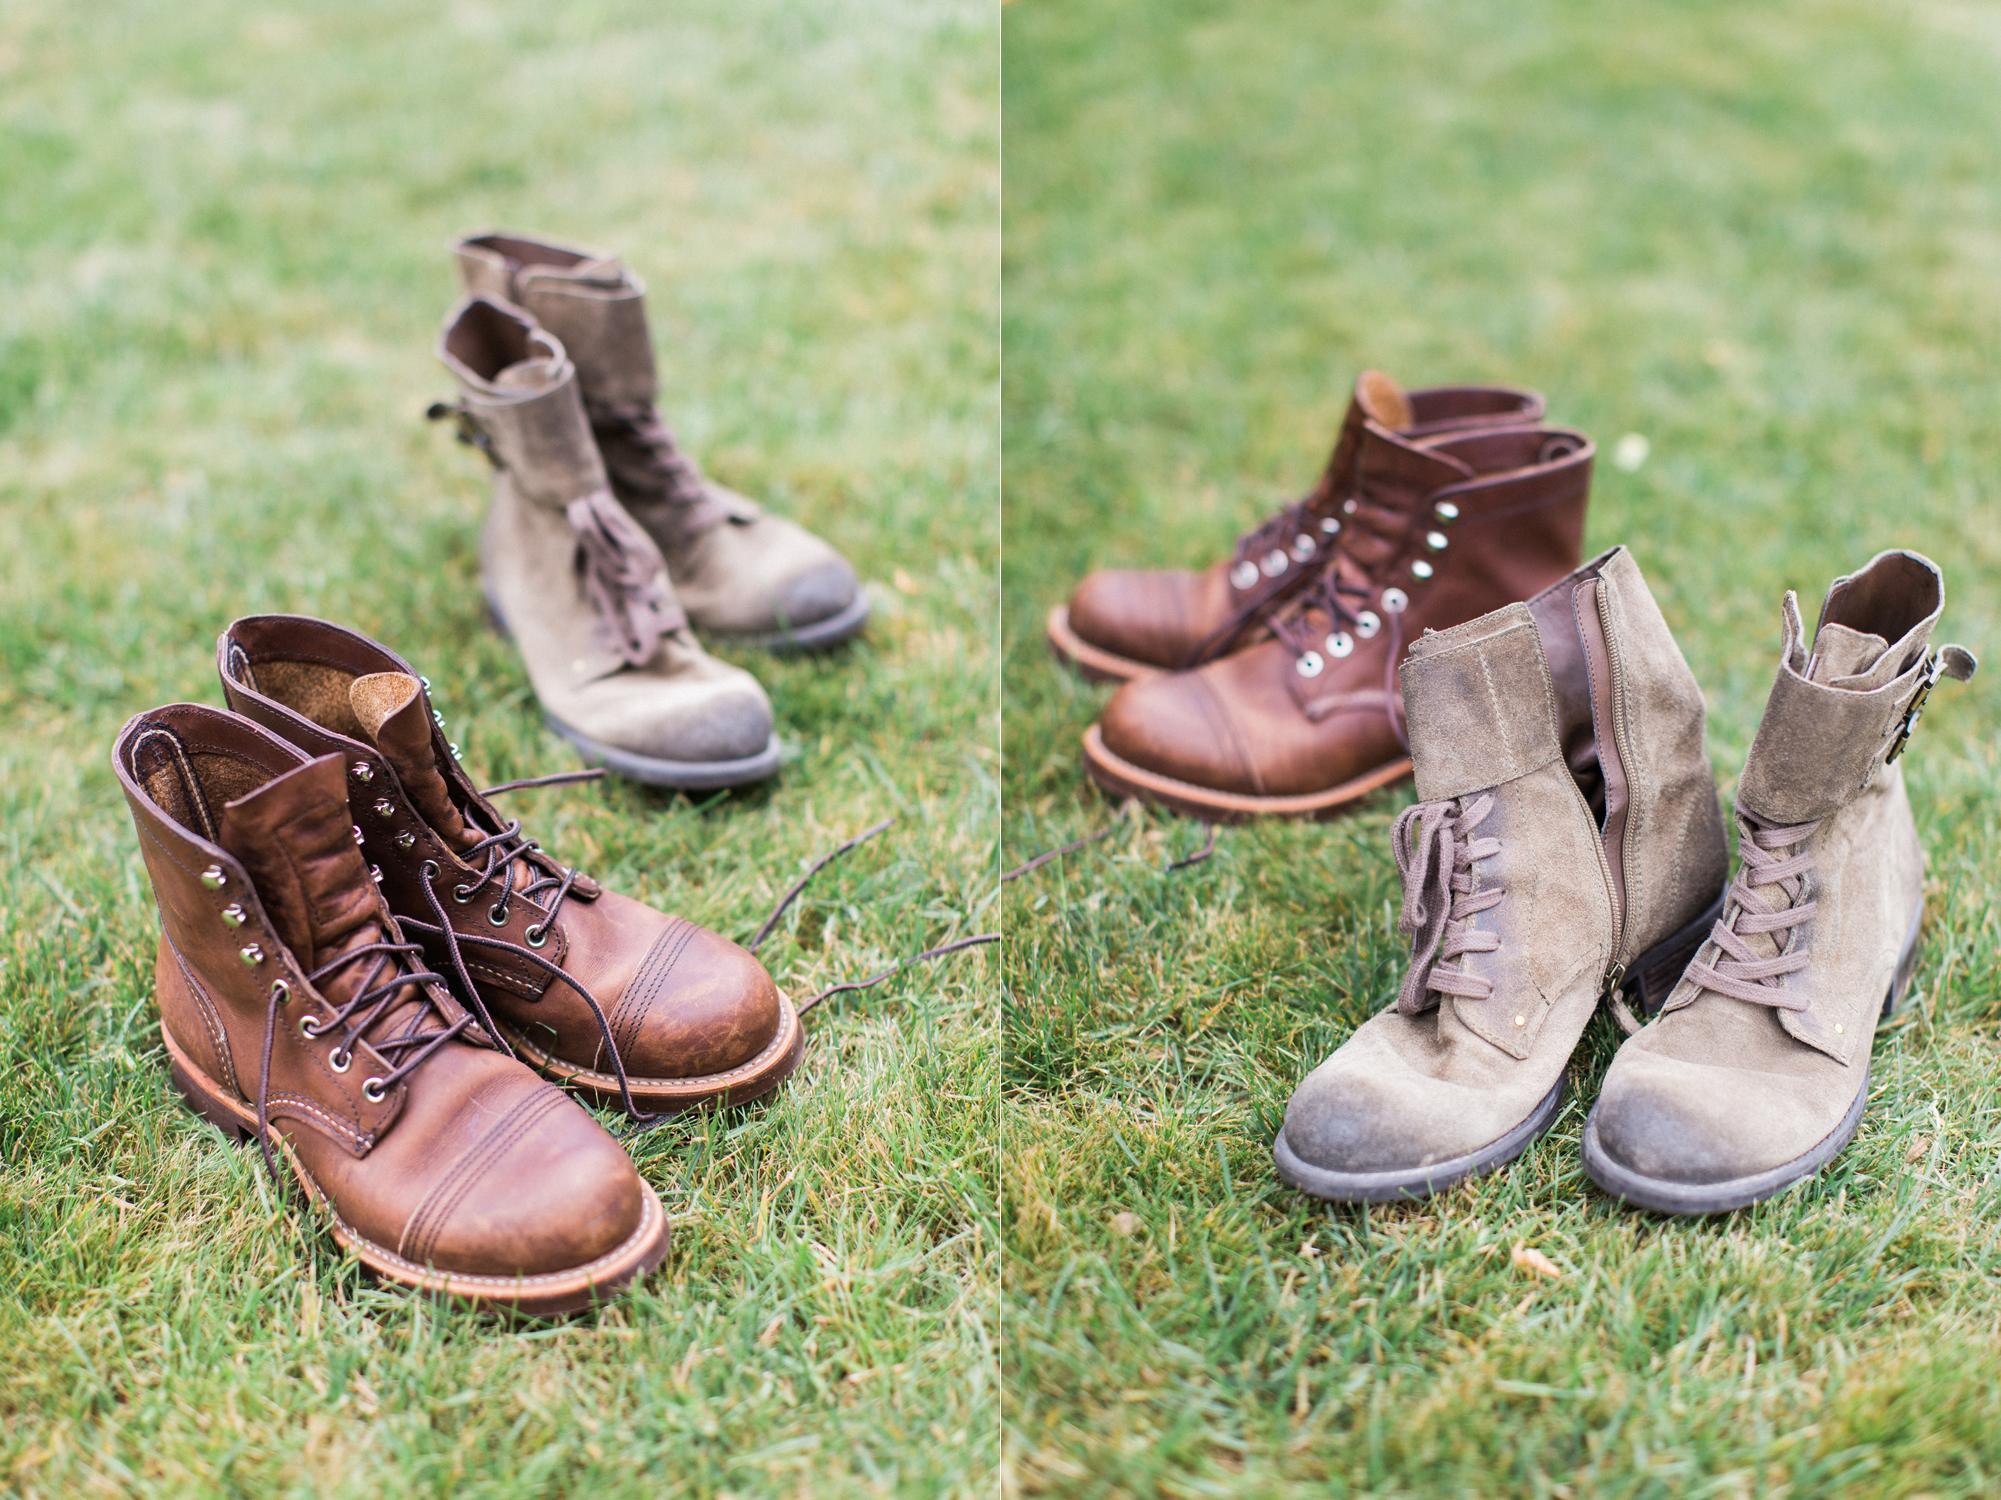 Outdoor elopement inspired wedding bridal boots.